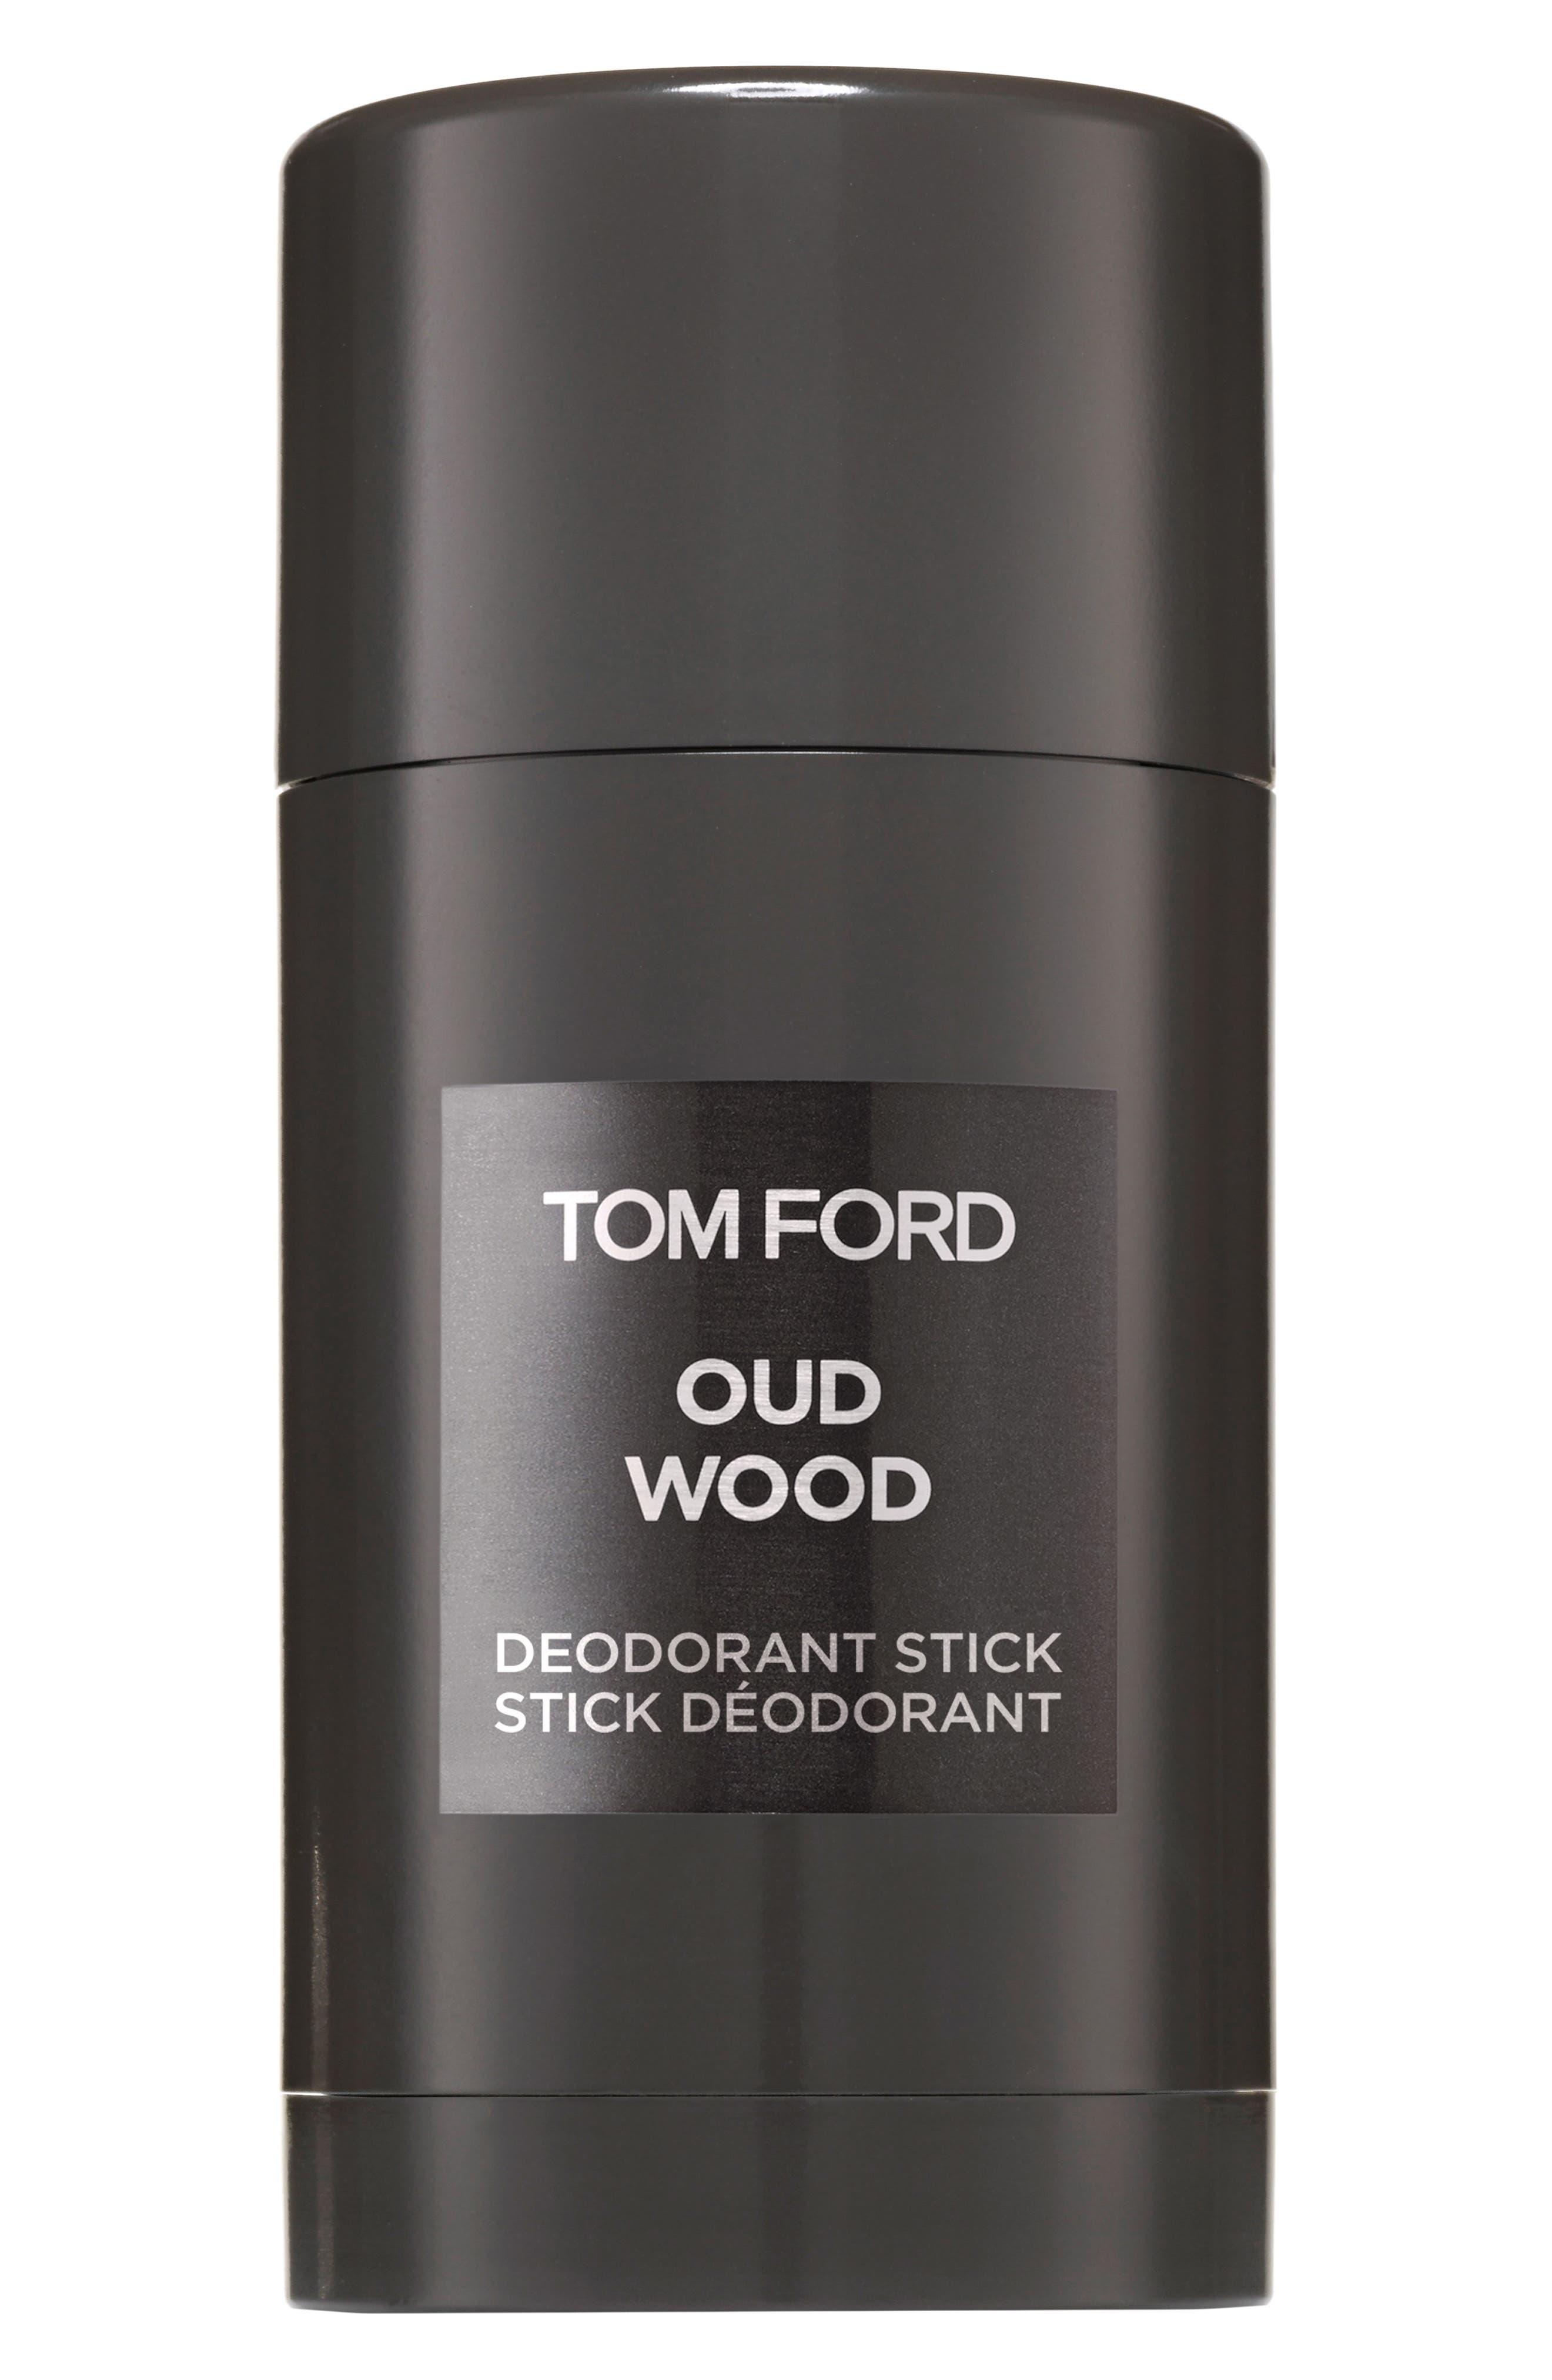 Alternate Image 1 Selected - Tom Ford 'Oud Wood' Deodorant Stick